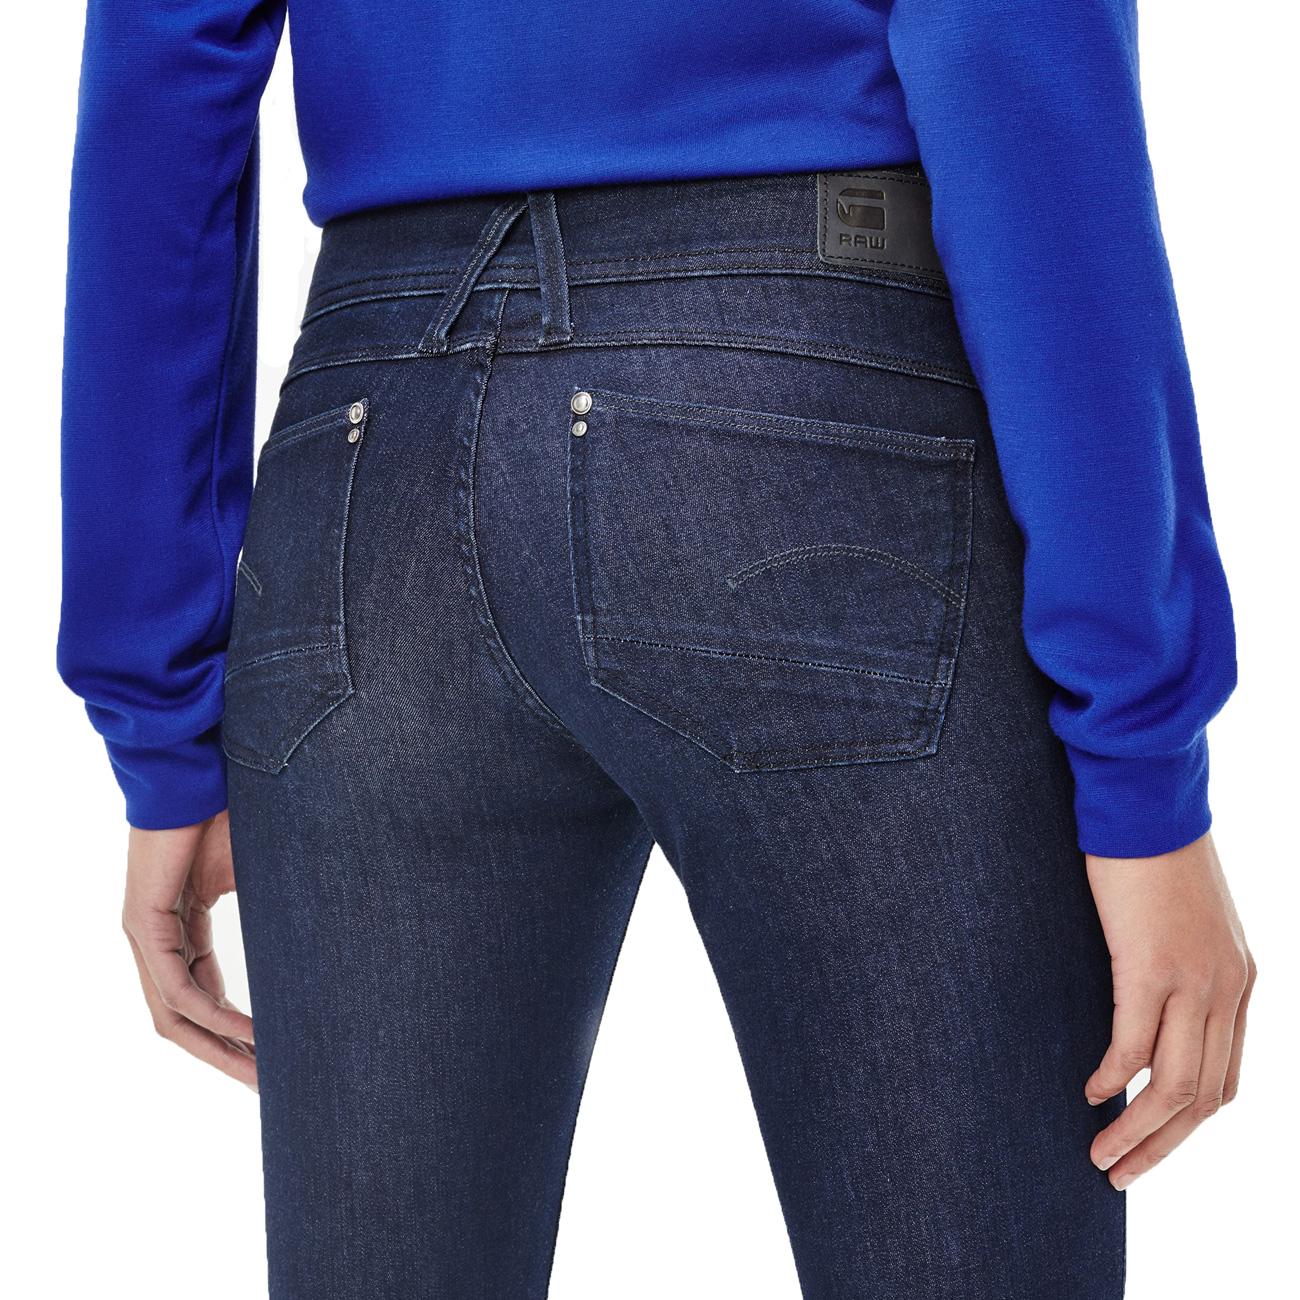 on sale 1251b aa2bd G-Star Damen Jeans Lynn Mid Skinny Wmn - rinsed